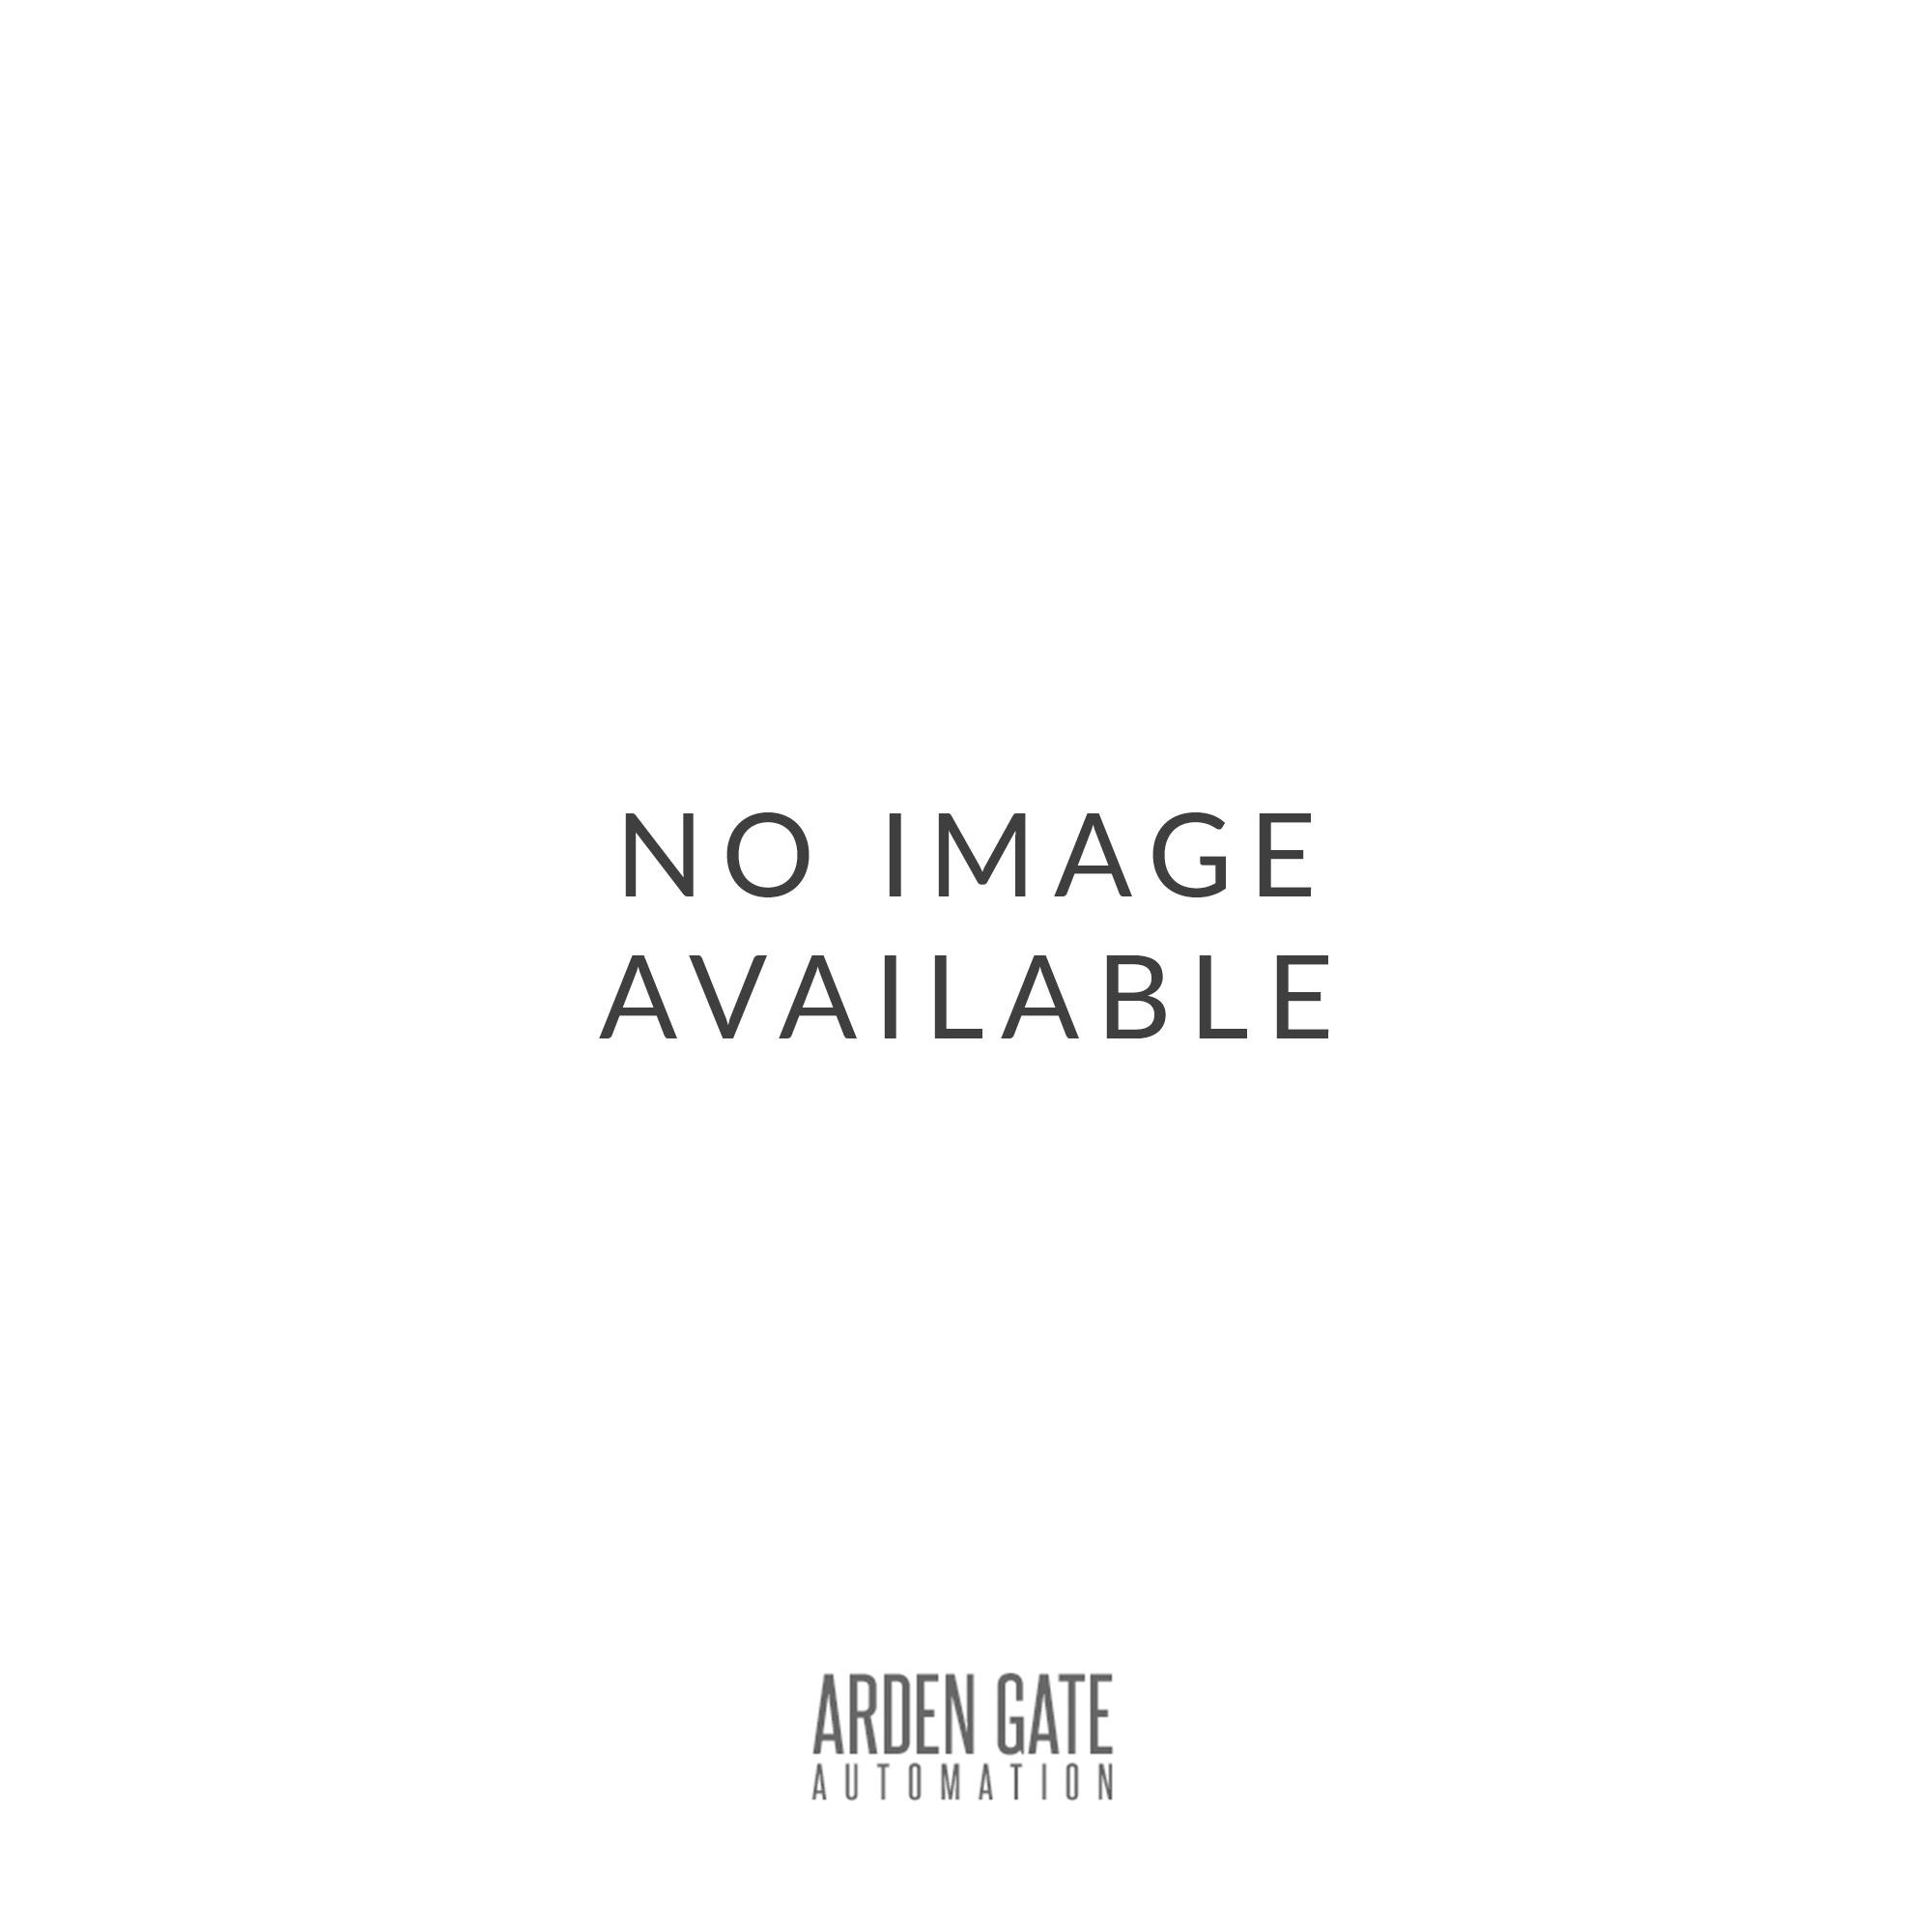 GENIUS Automation Roller 230v Twn kit 110 degree